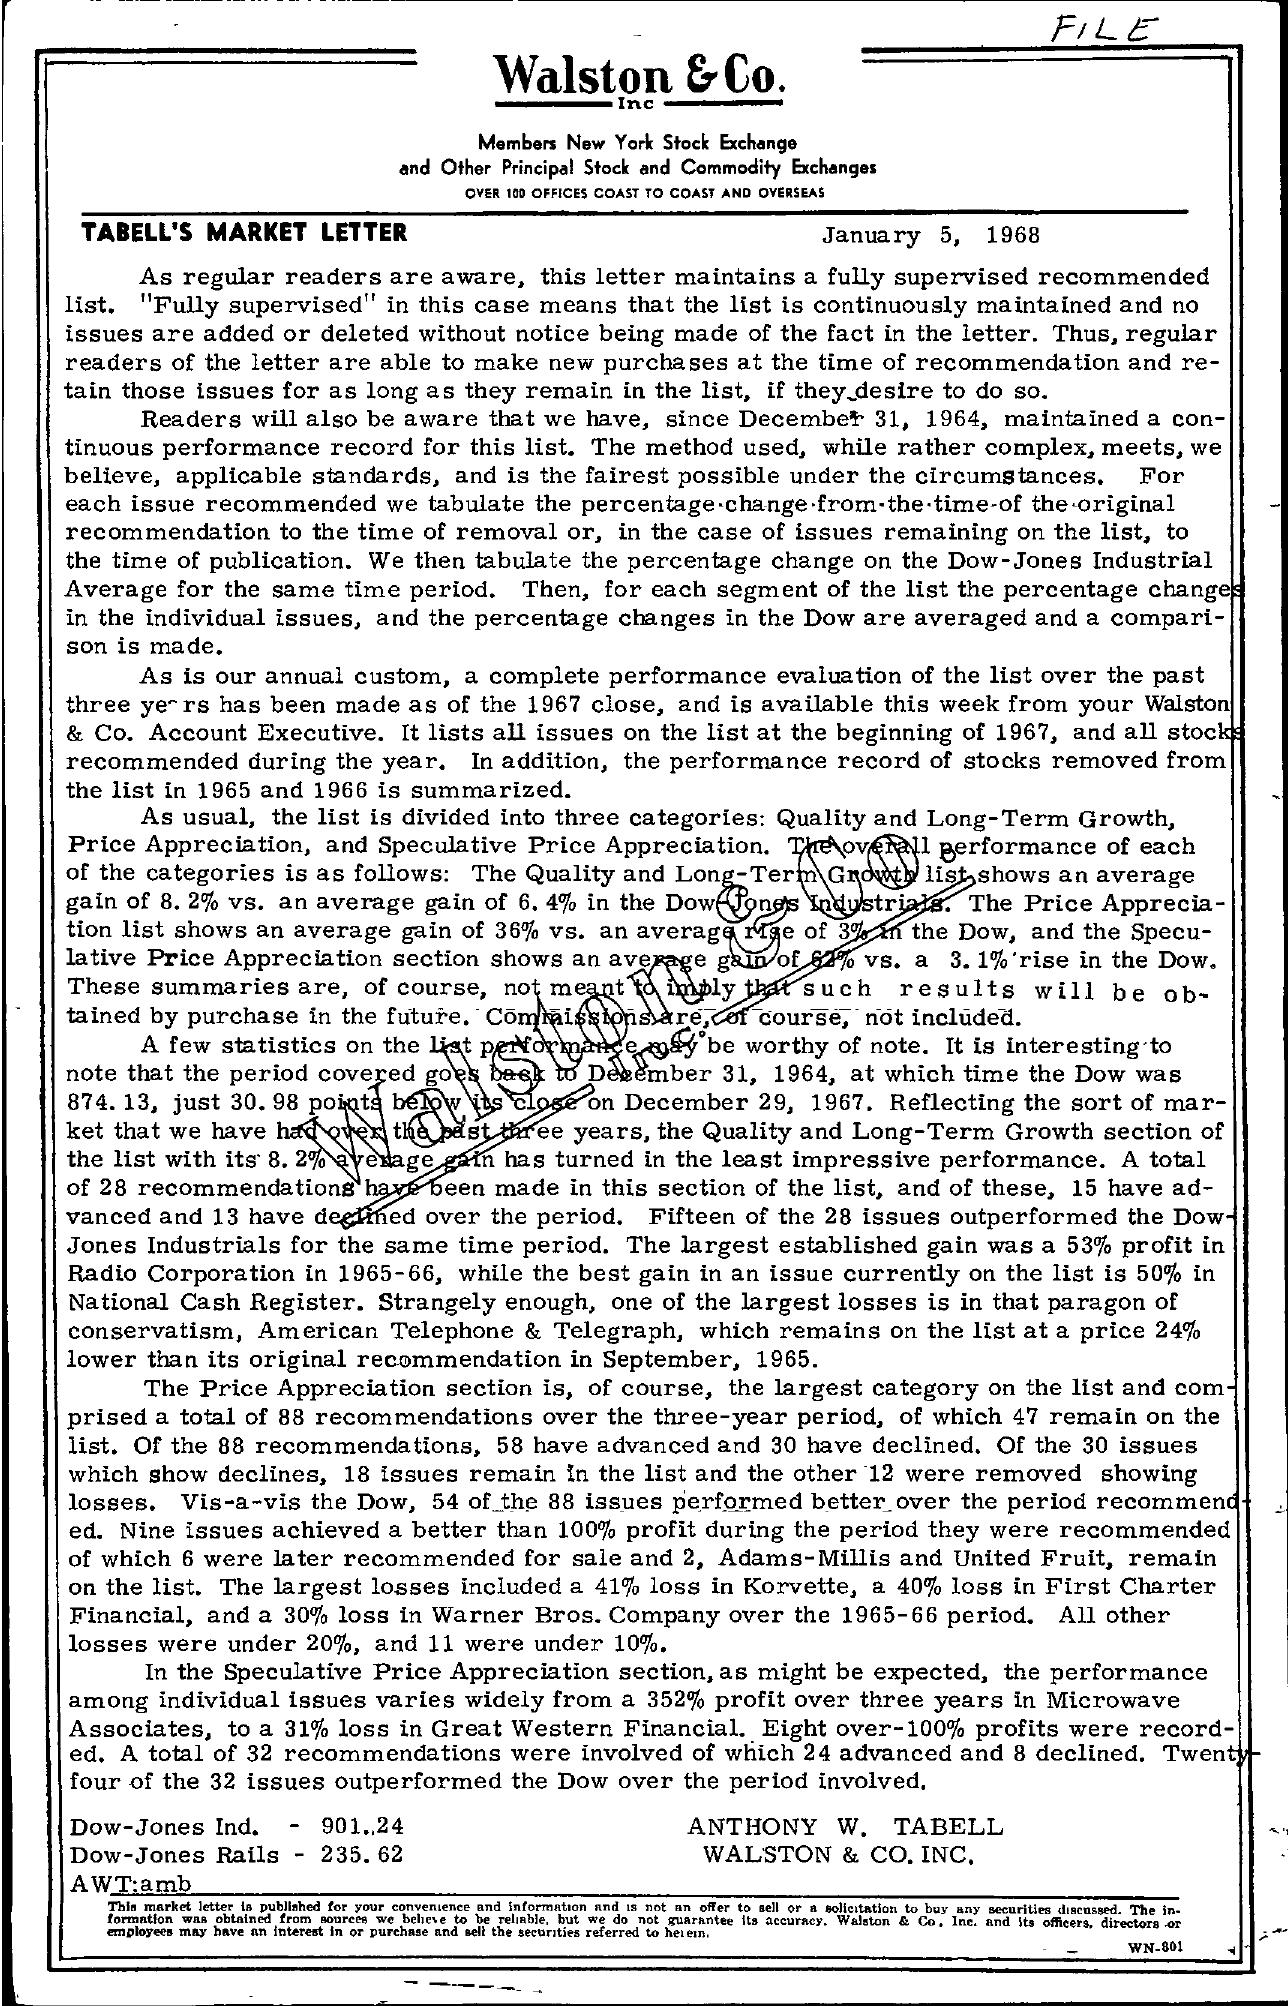 Tabell's Market Letter - January 05, 1968